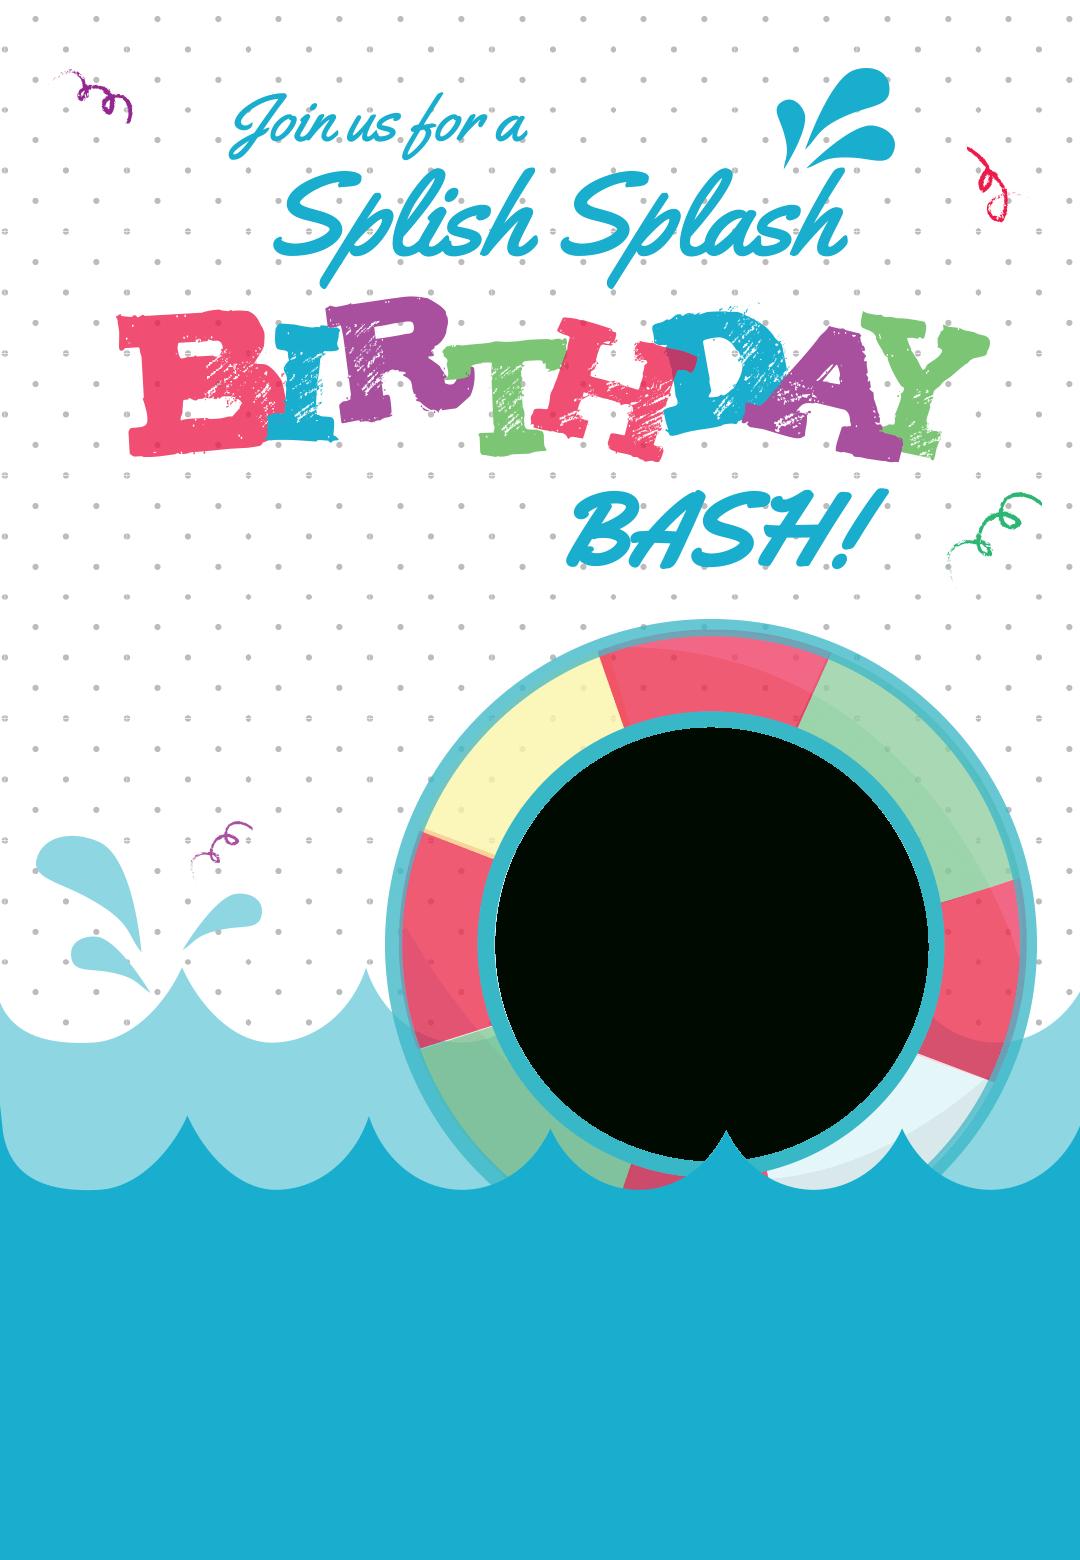 Splish Splash - Free Printable Summer Party Invitation Template - Free Printable Pool Party Birthday Invitations